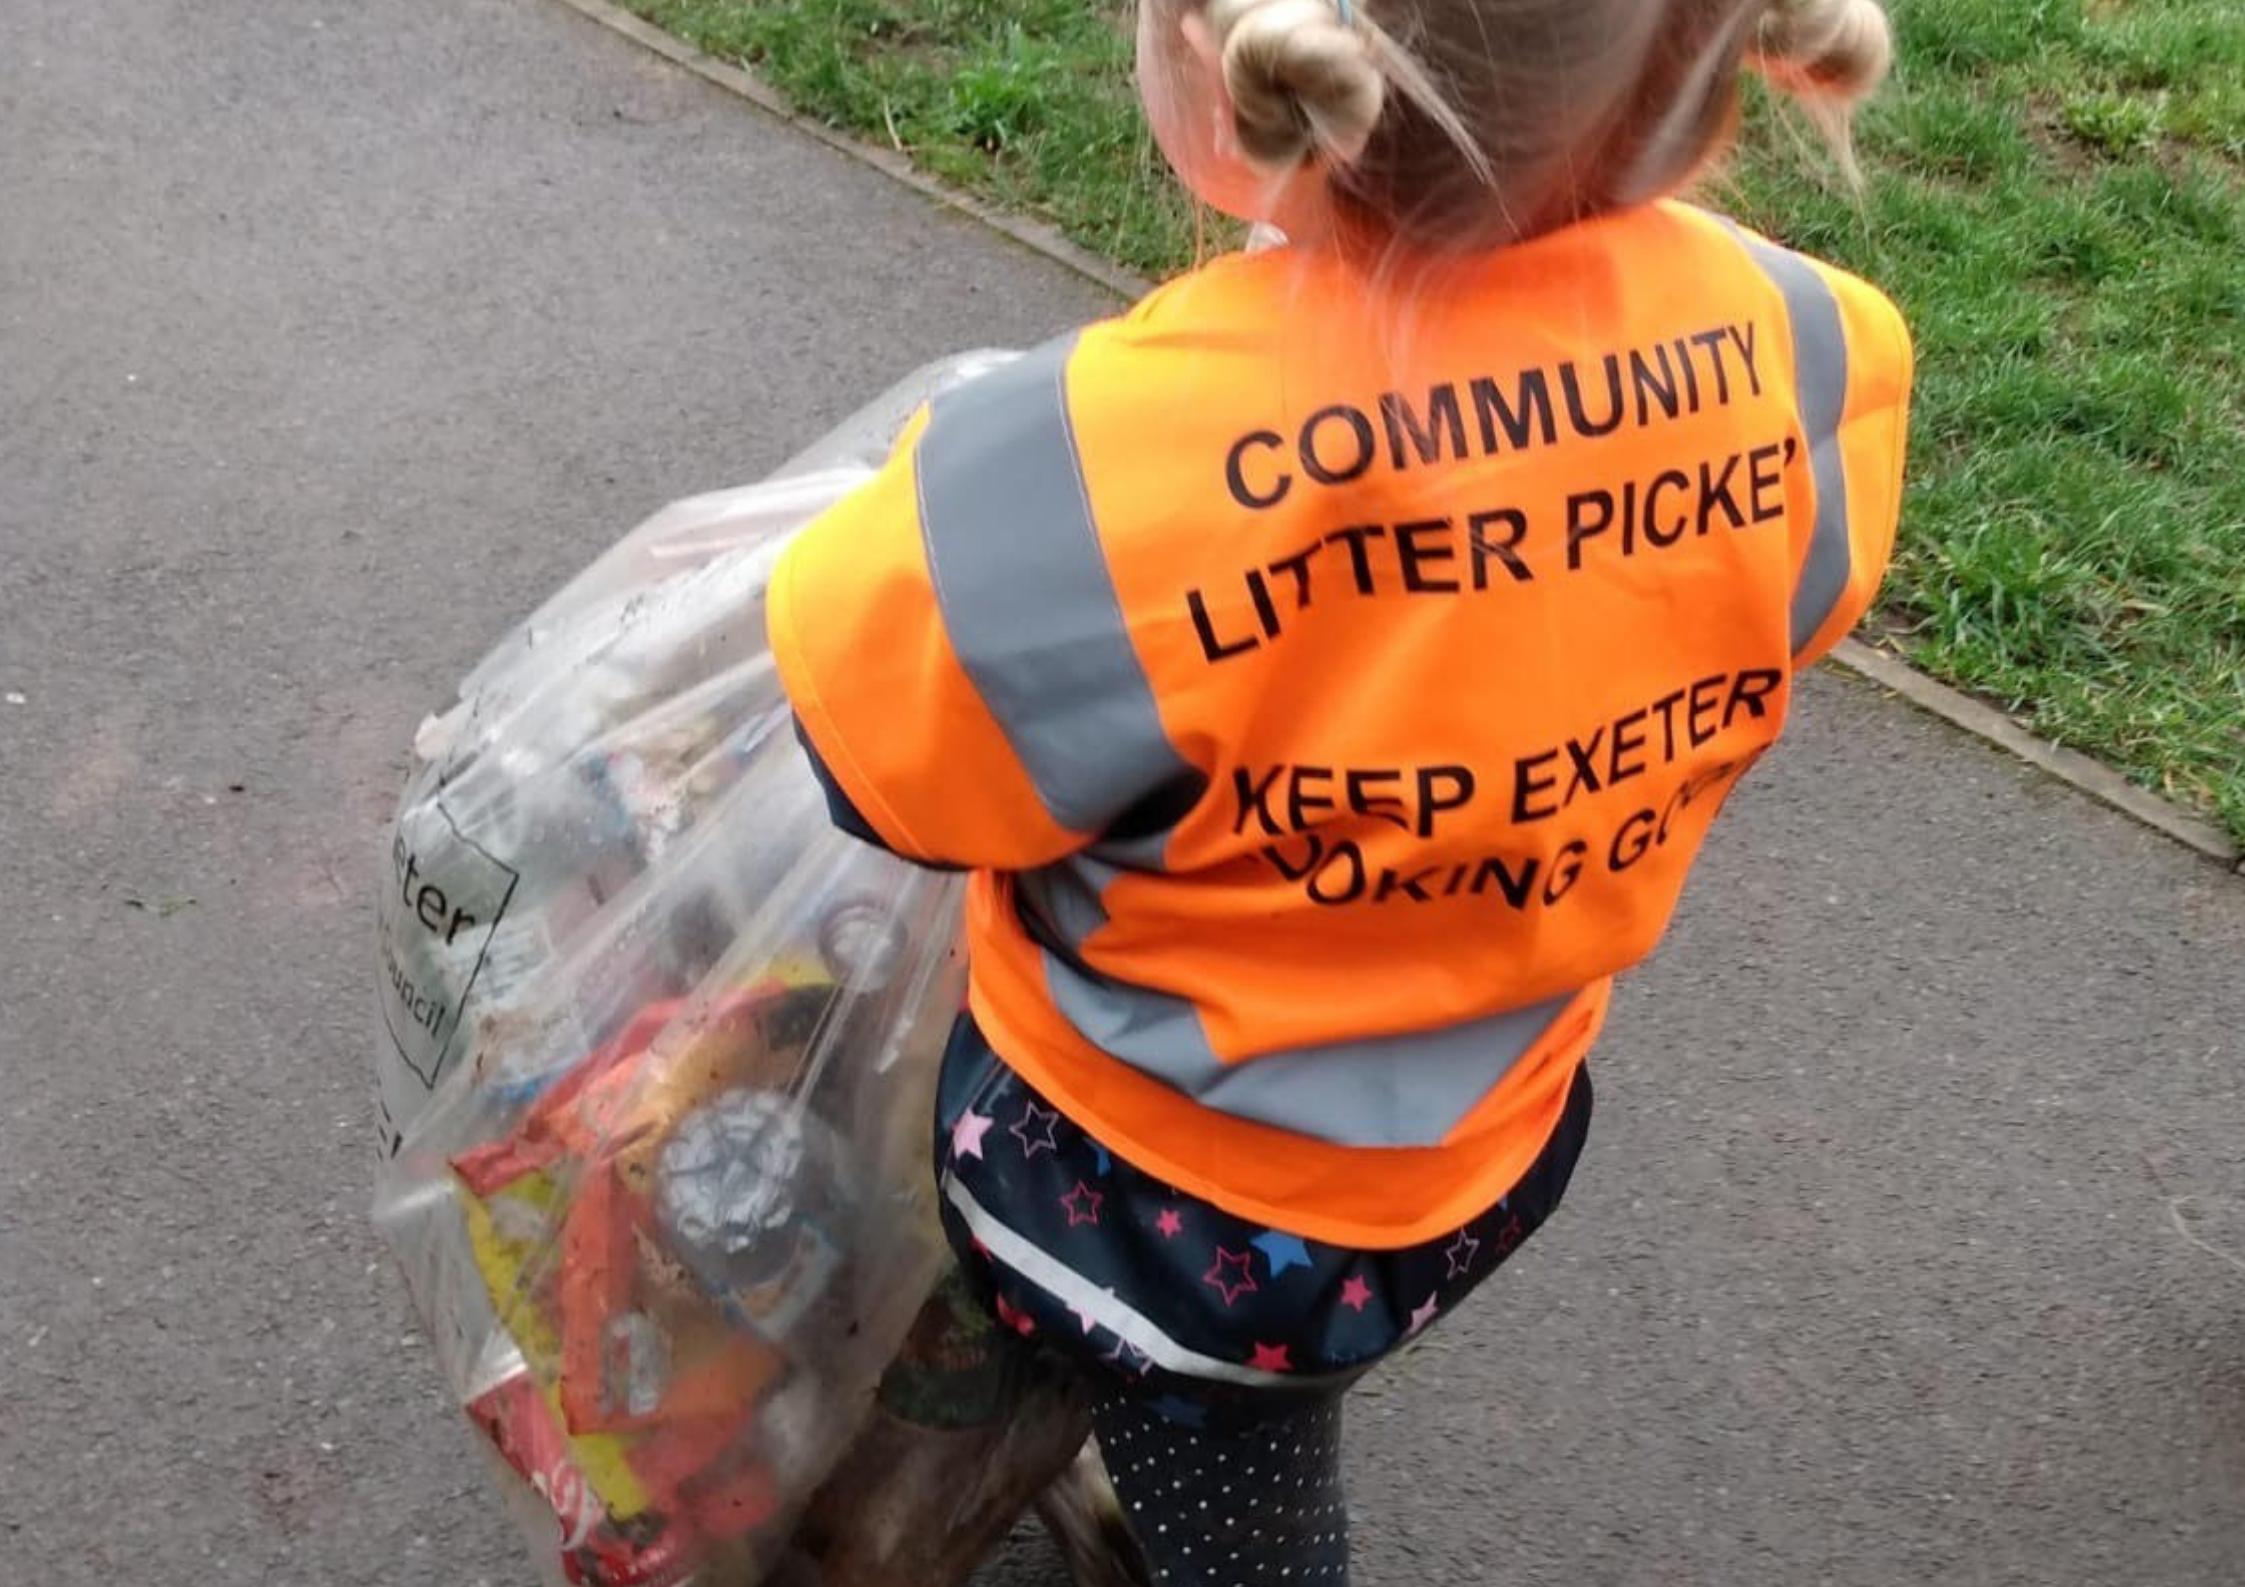 Little Litter Picking Champs